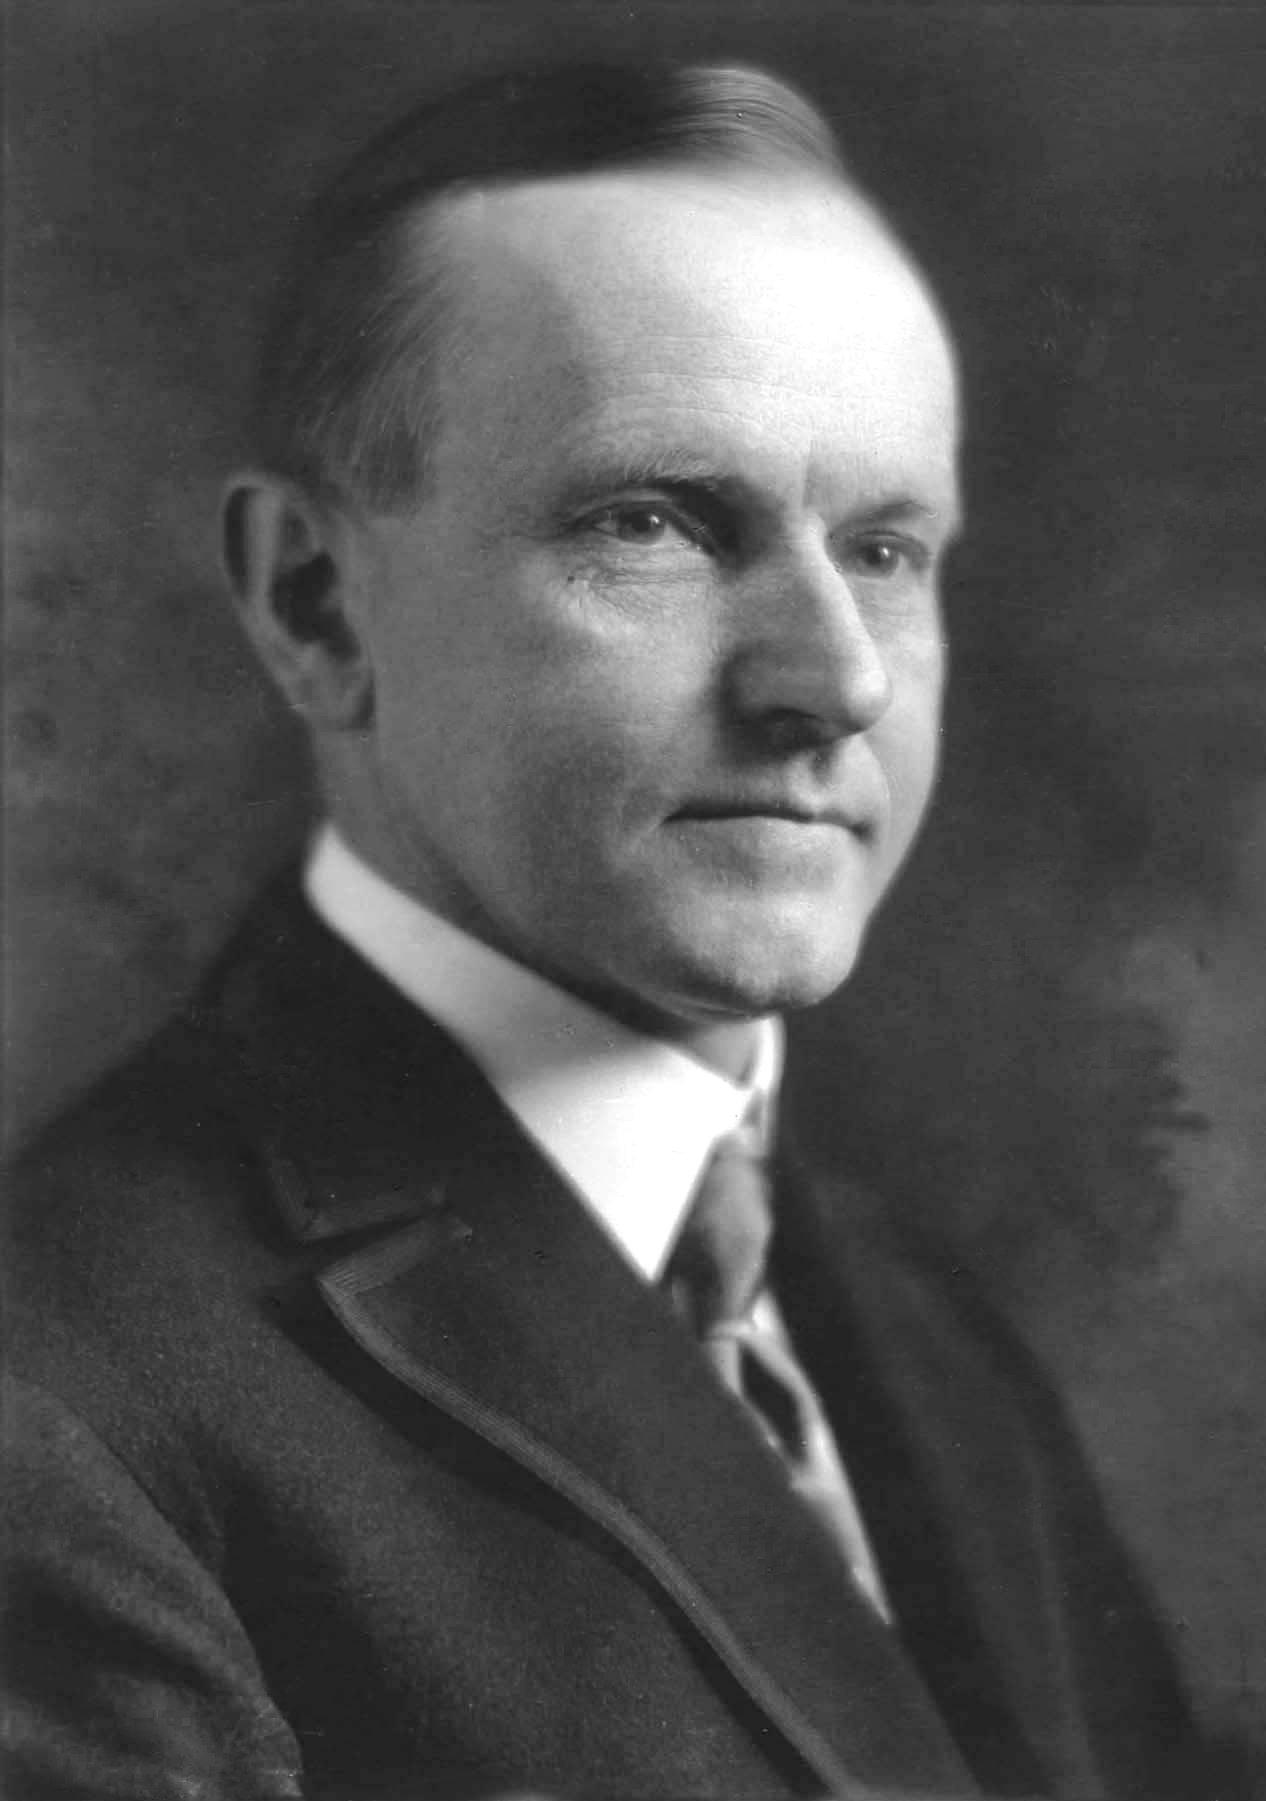 US President Calvin Coolidge in 1923; picture taken by Armenian-American photographer John Garo (1875-1939)